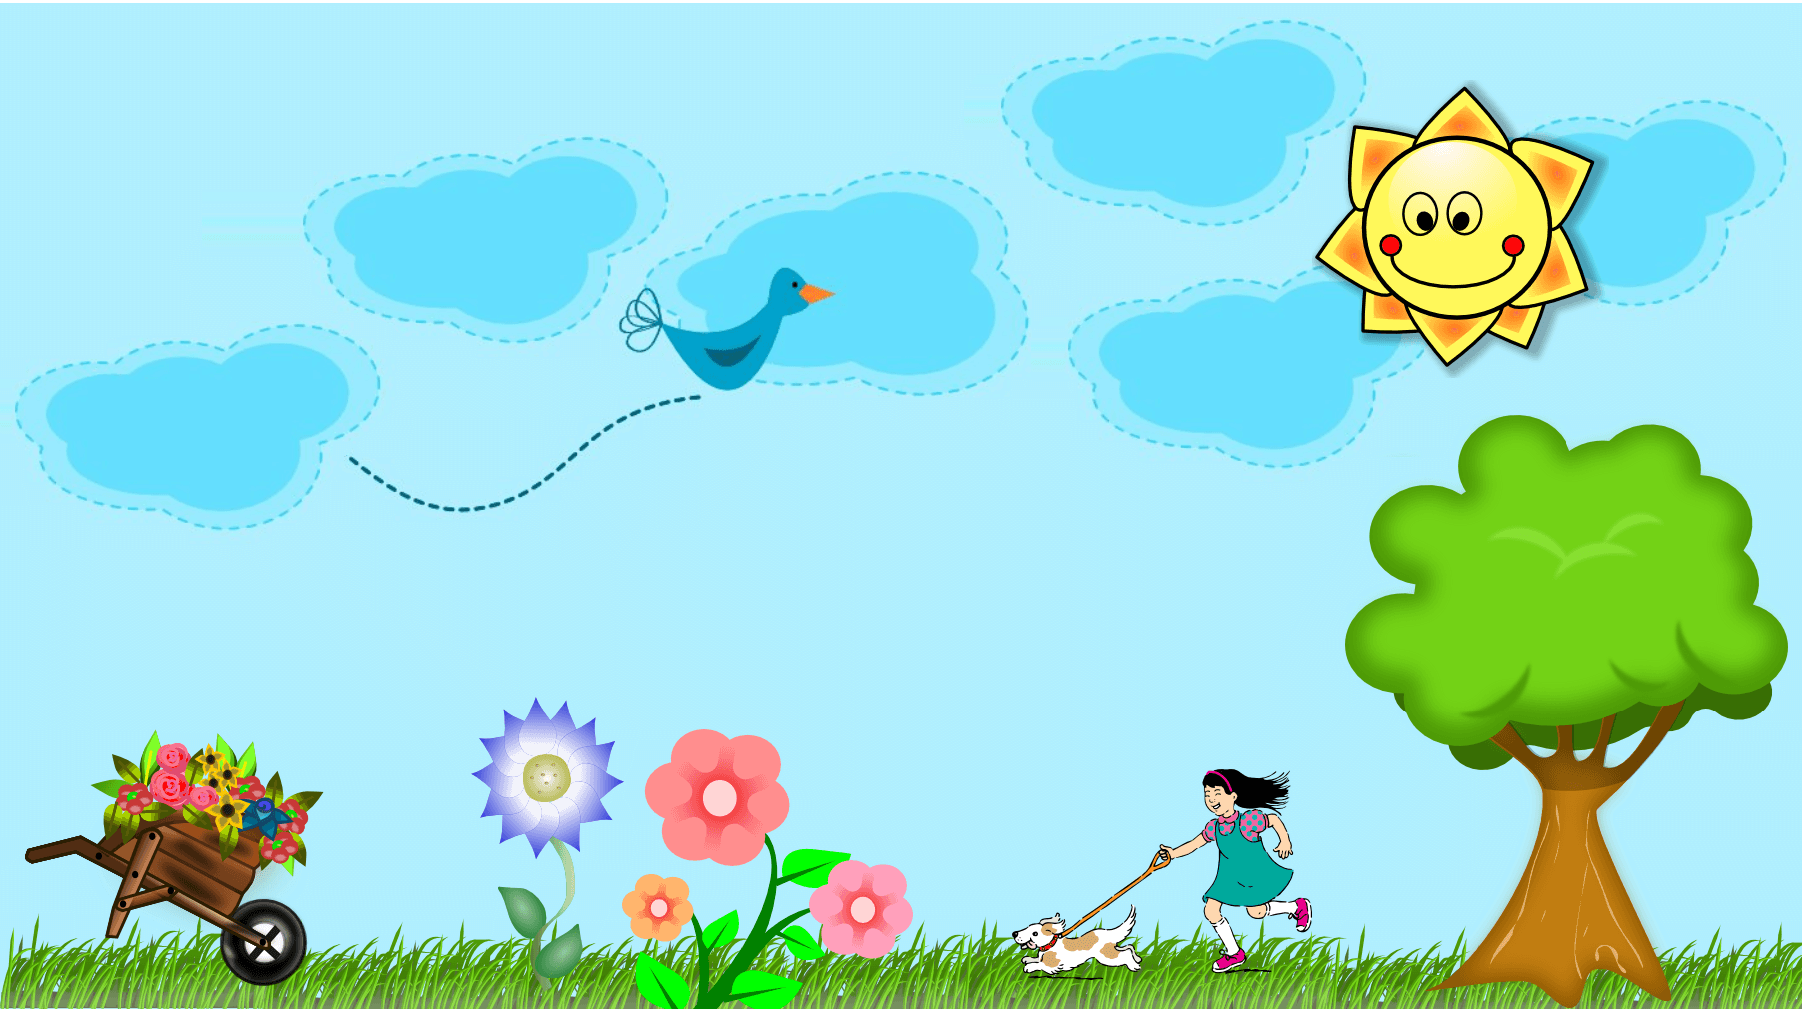 Garden design cliparts zone. Gardening clipart animated